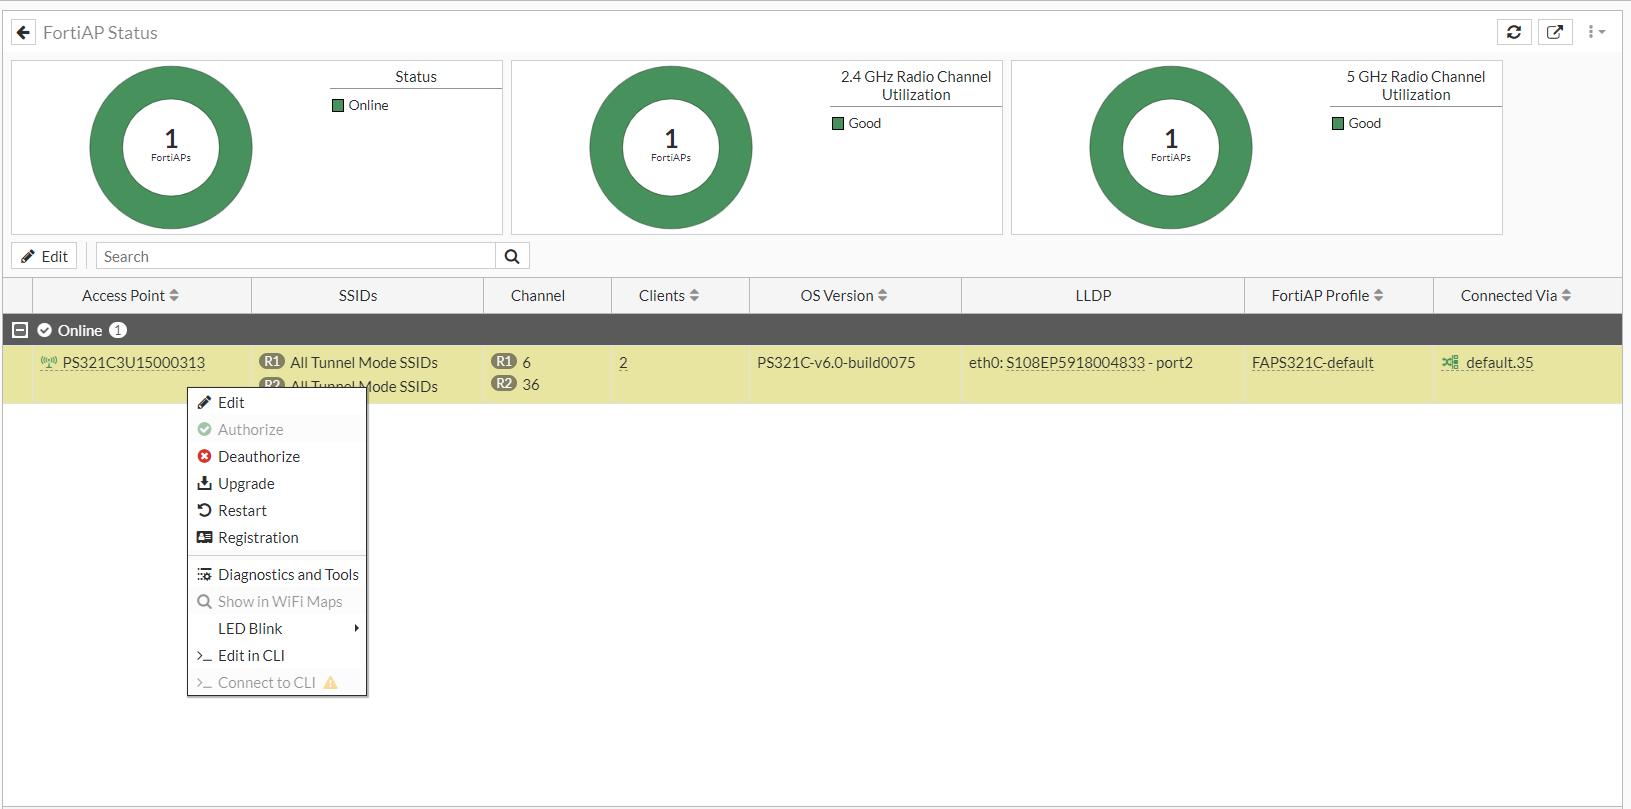 FortiAP Status monitor right-click menu